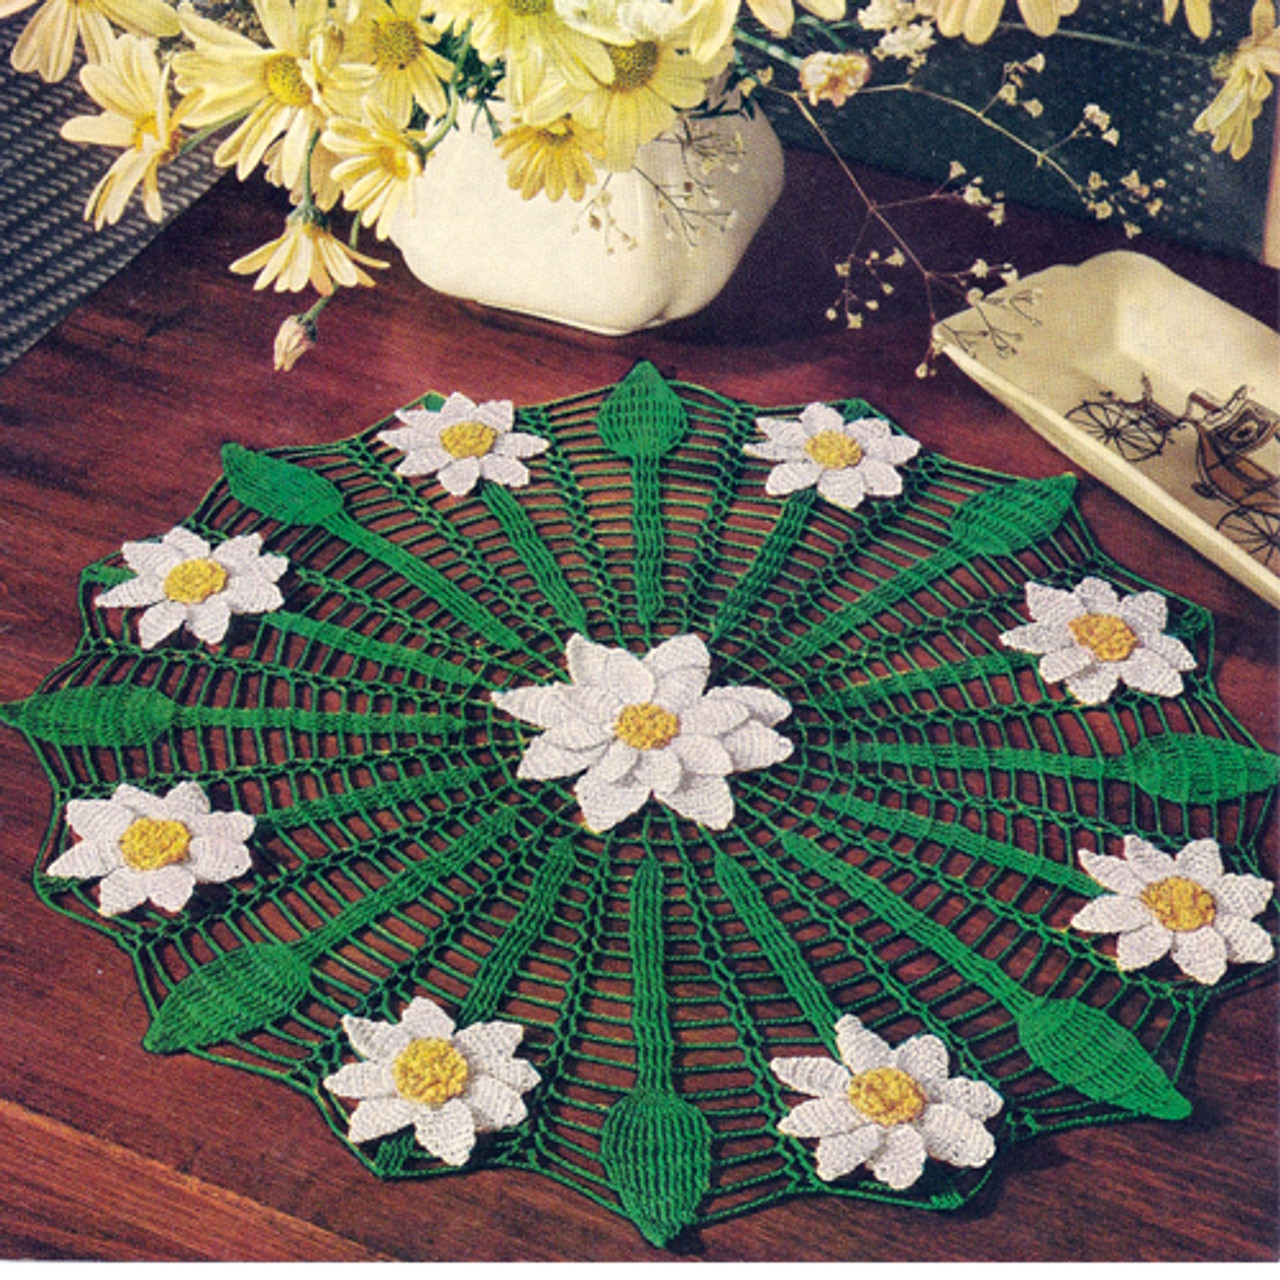 Crochet Daisy Spiderweb Doily Pattern